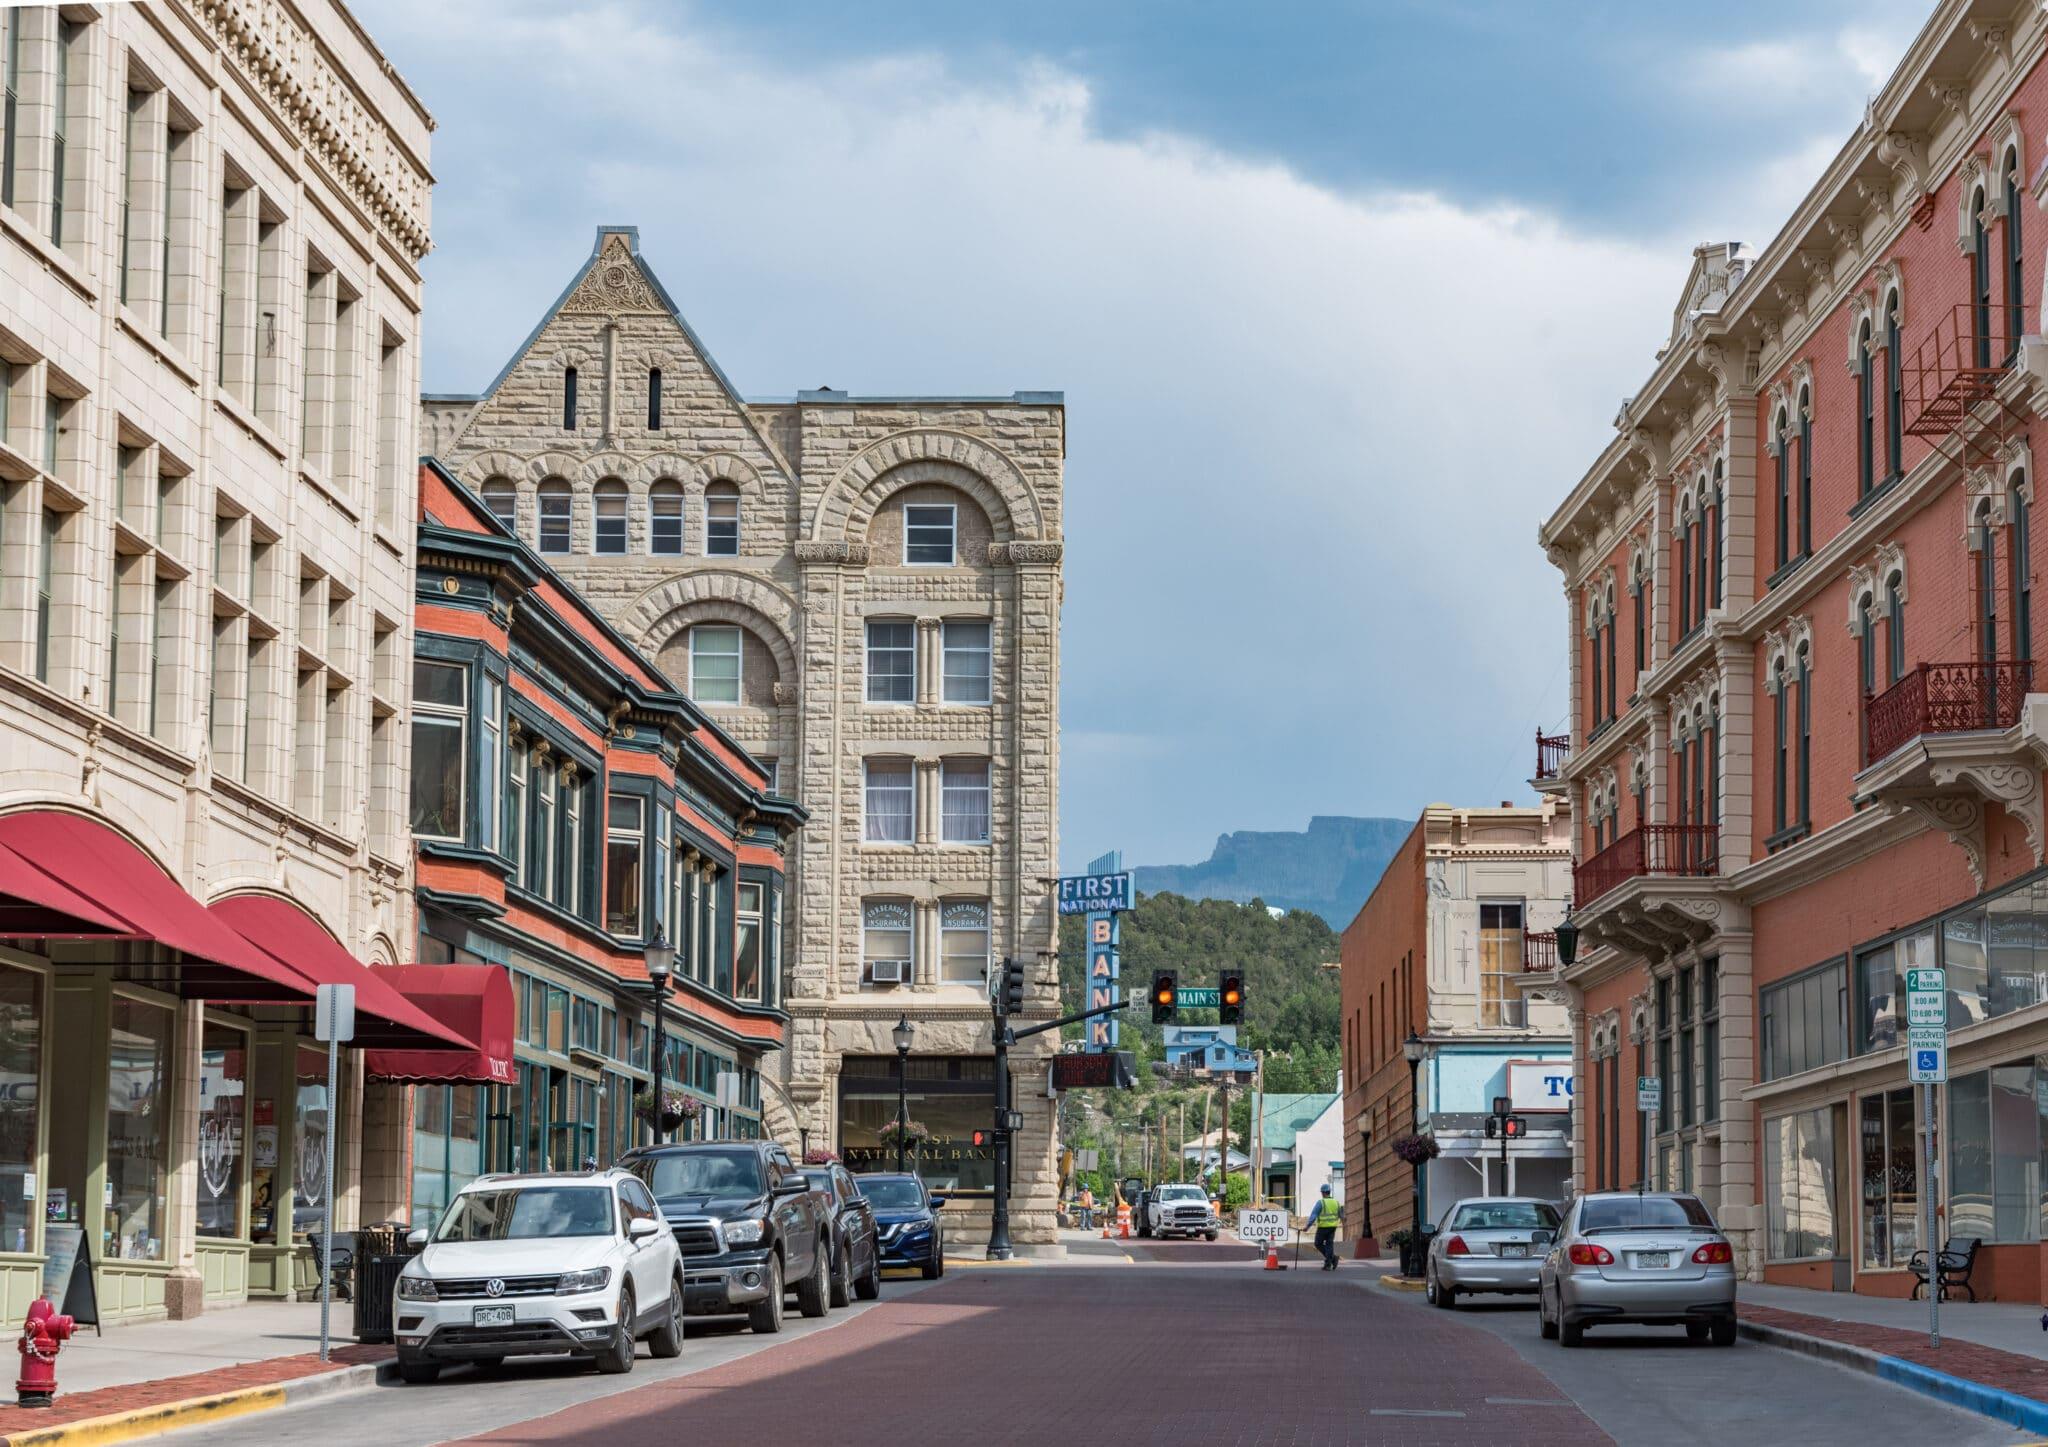 image of downtown Trinidad